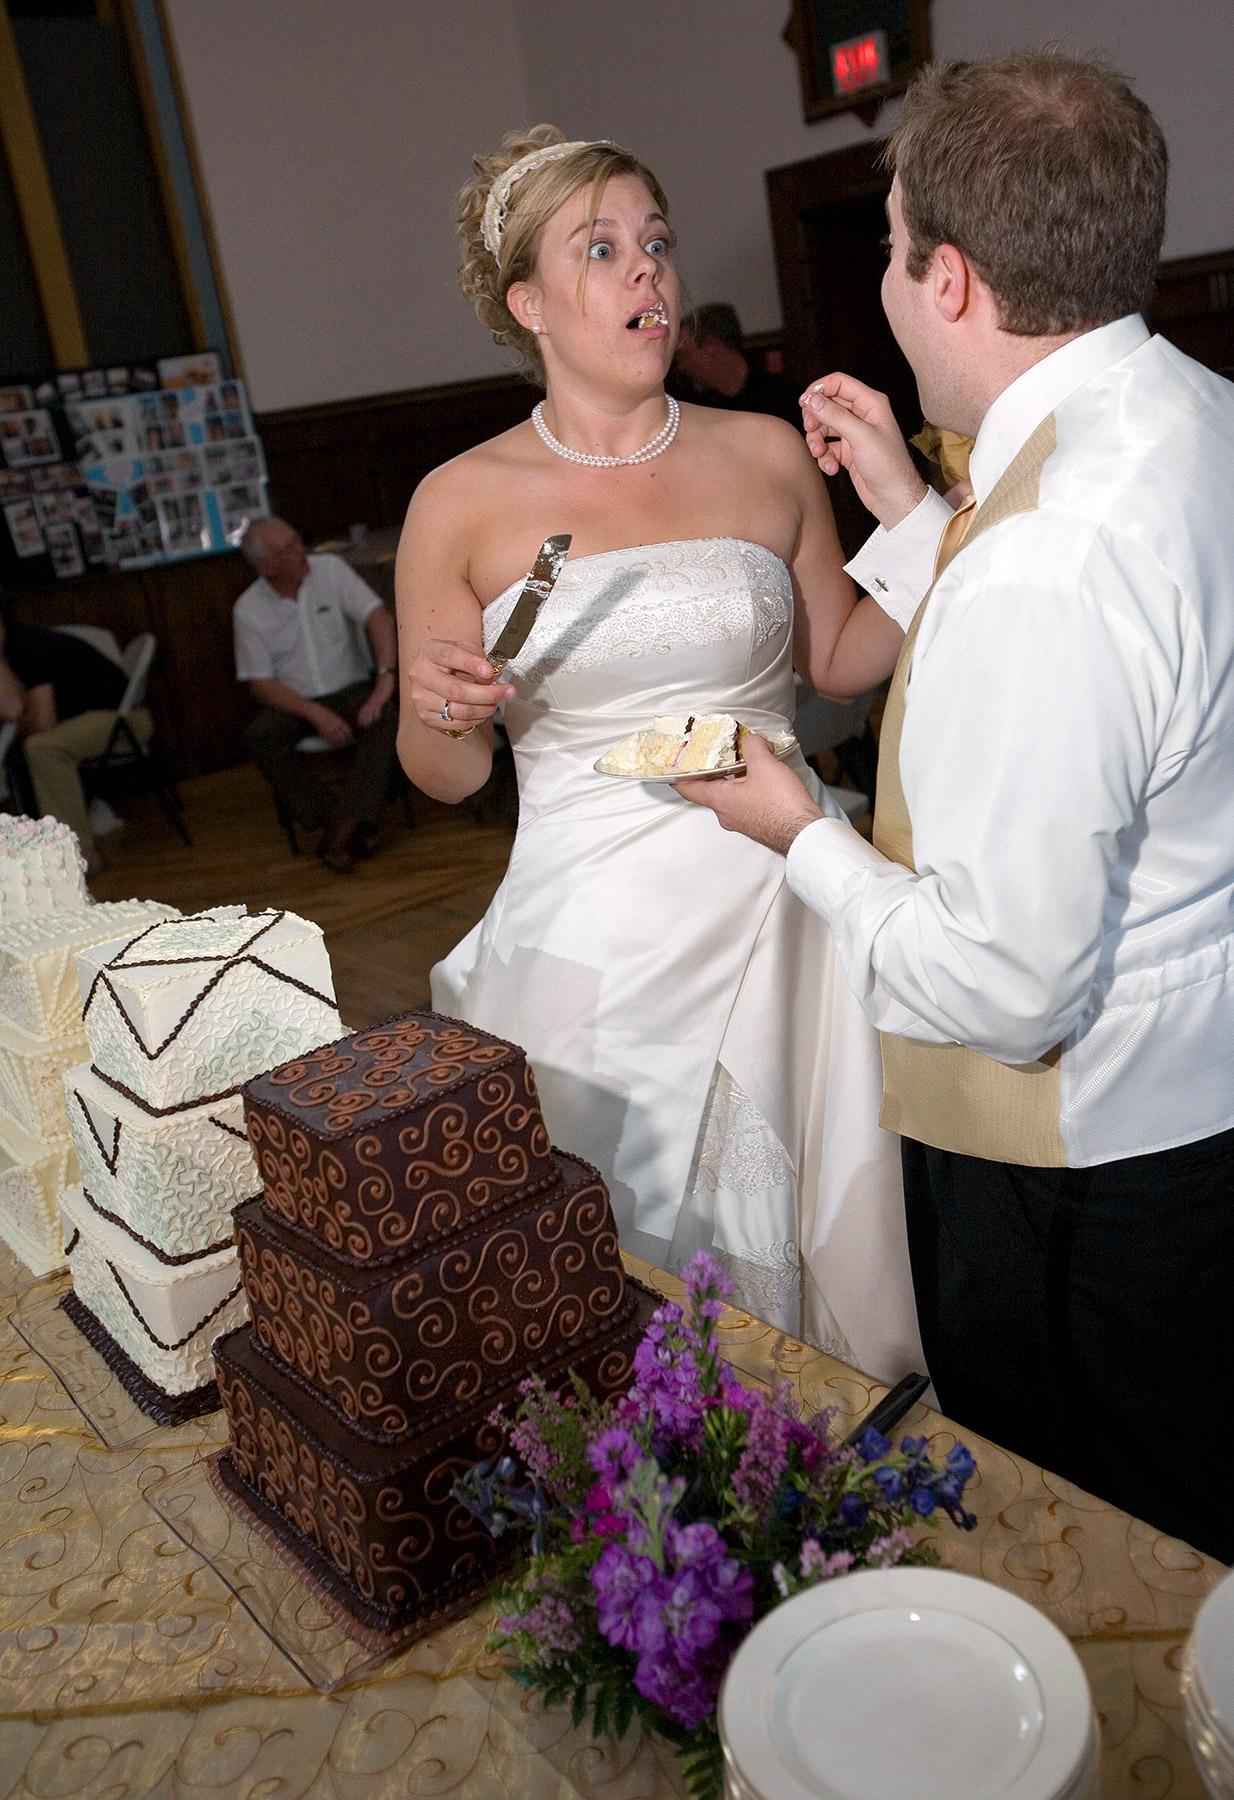 wedding-photography-saint-paul-mark-kegans-657.jpg